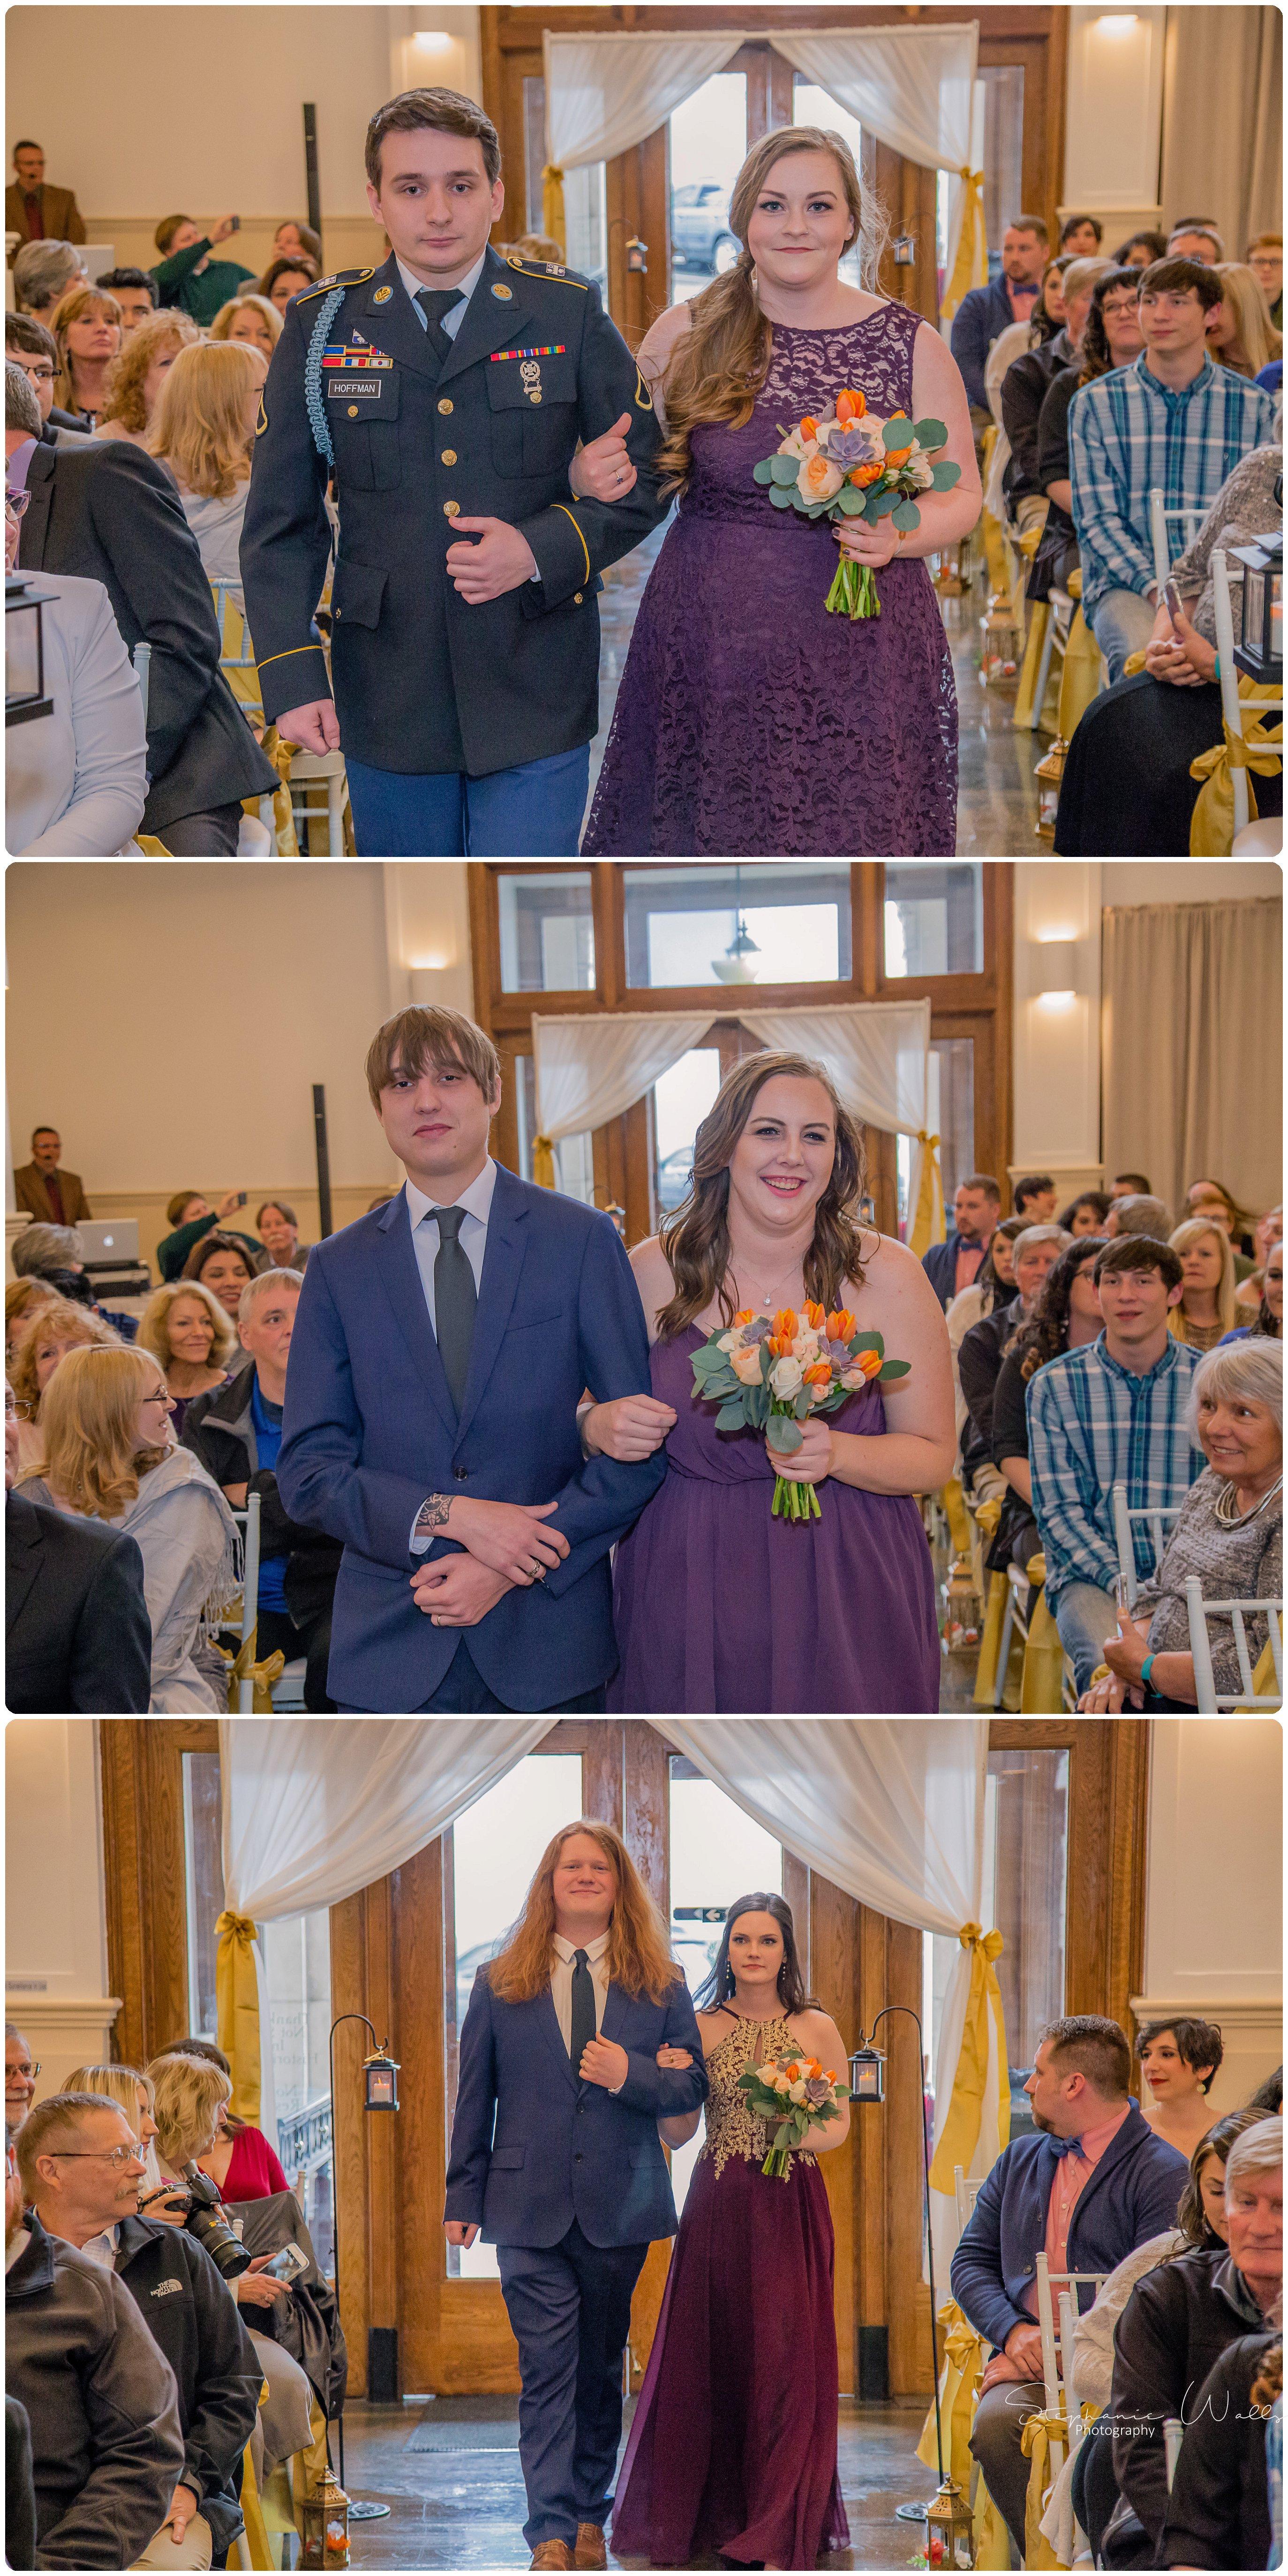 Sears Ceremony 020 The Hero & The Starlet | Monte Cristo Ballroom | Stephanie Walls Photography Weddings